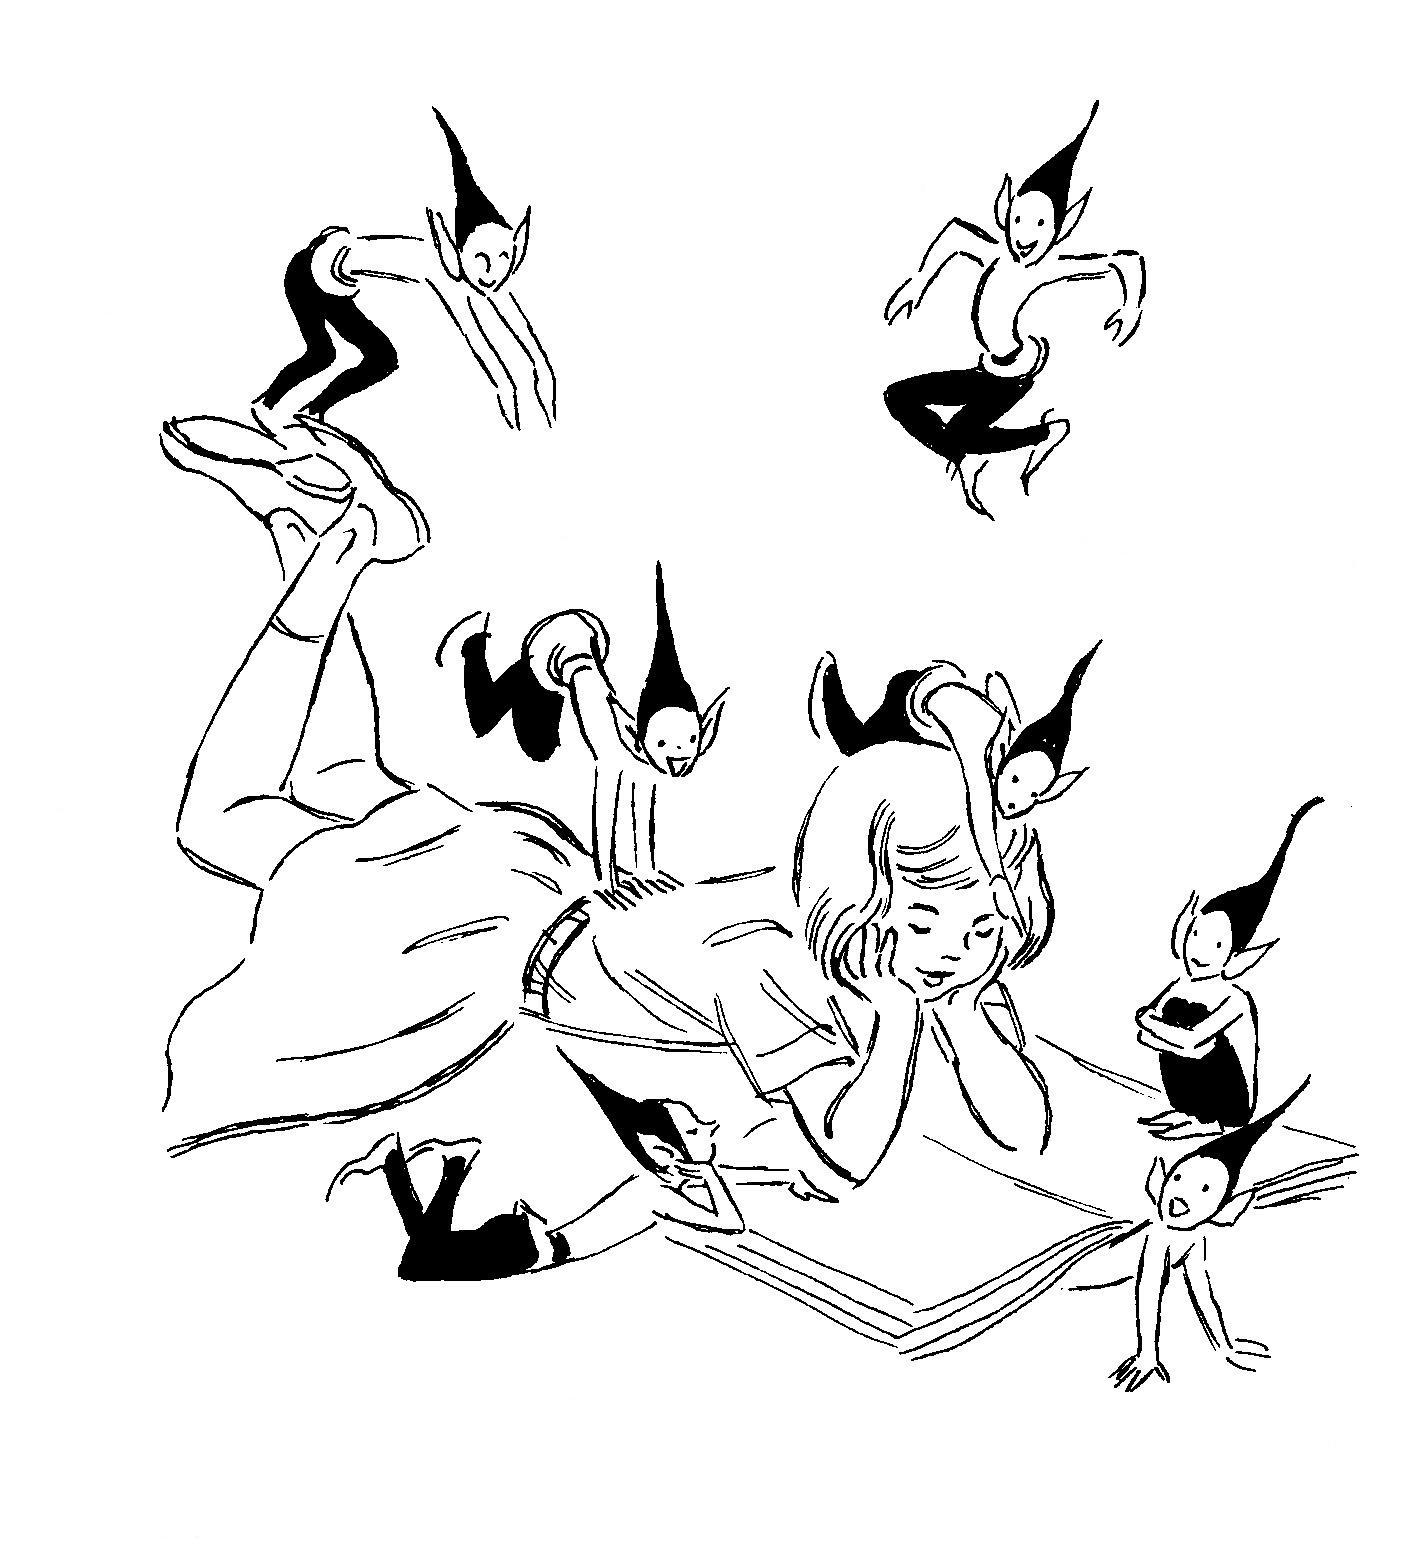 Brownie And Girl Reading on Jitterbug Line Dance